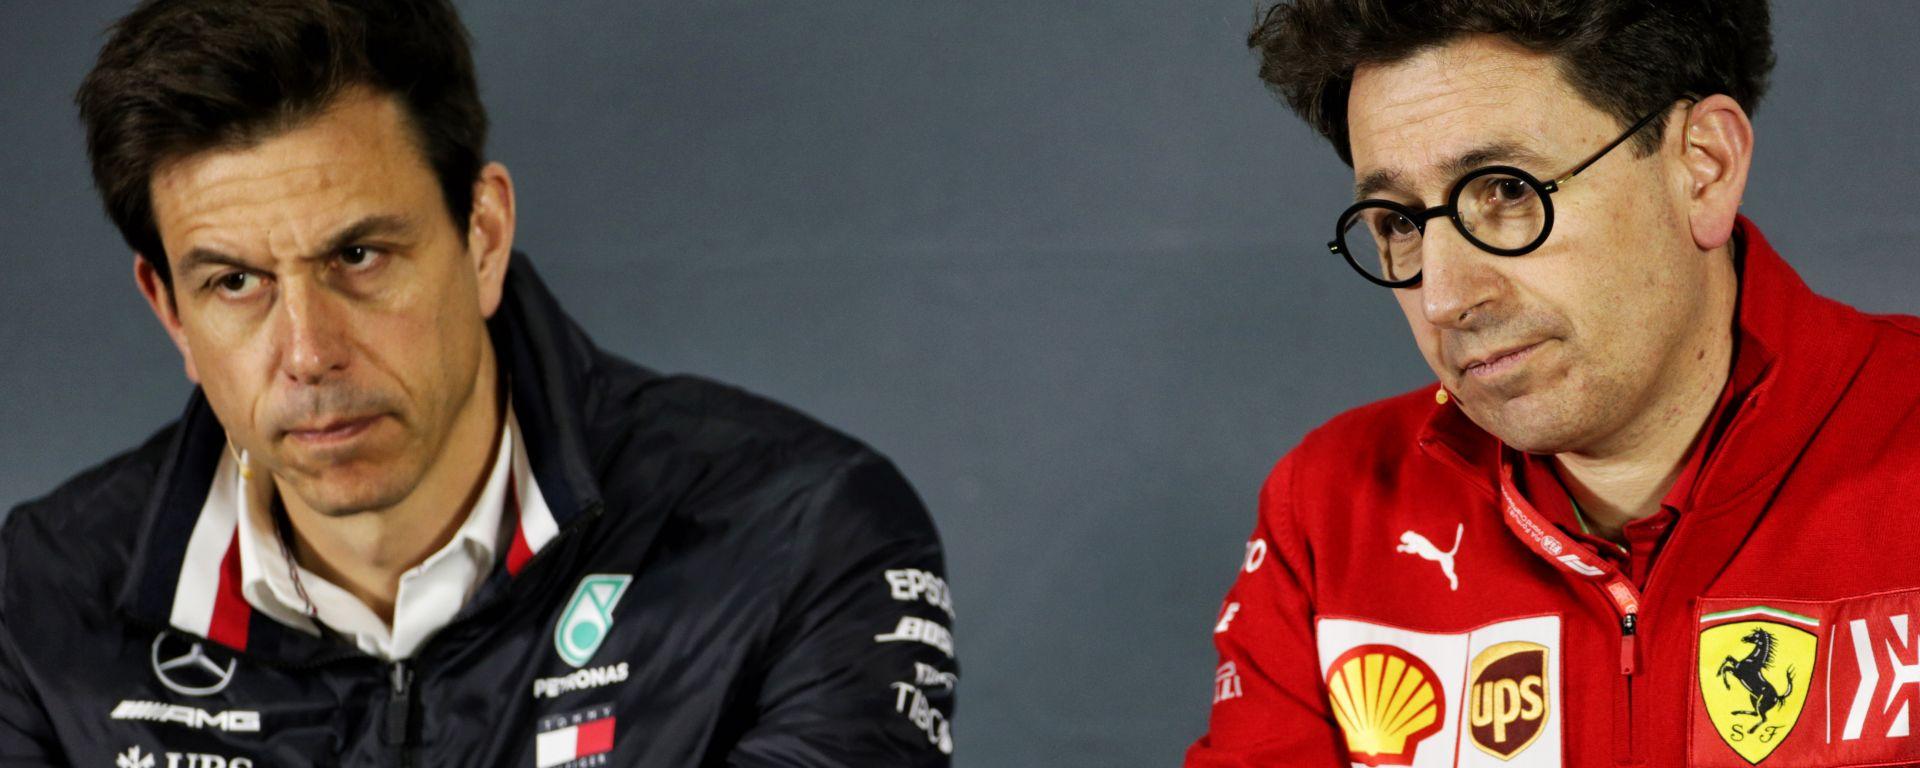 F1 2019: Toto Wolff (Mercedes) e Mattia Binotto (Ferrari)